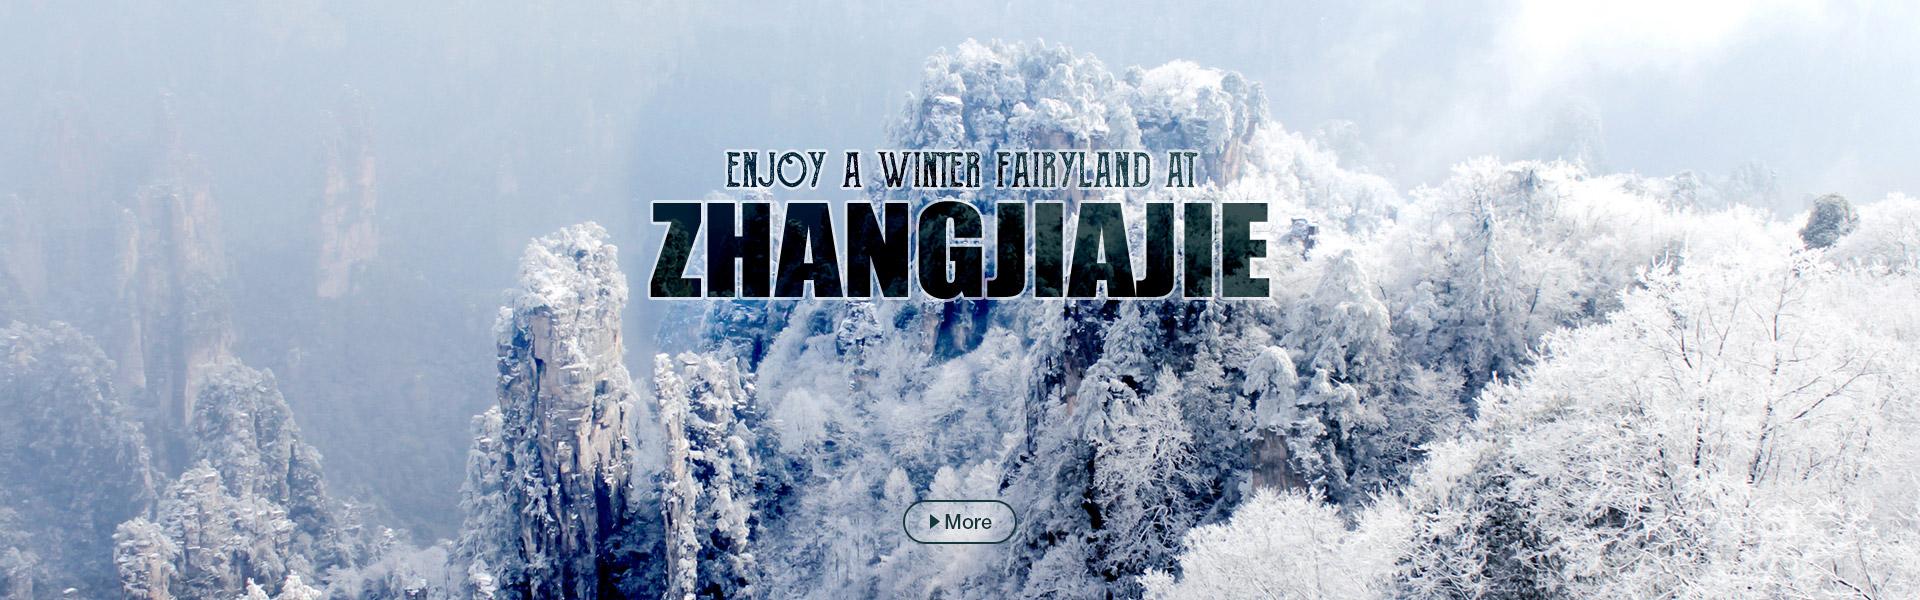 Enjoy a Winter Fairyland at Zhangjiajie for CTA